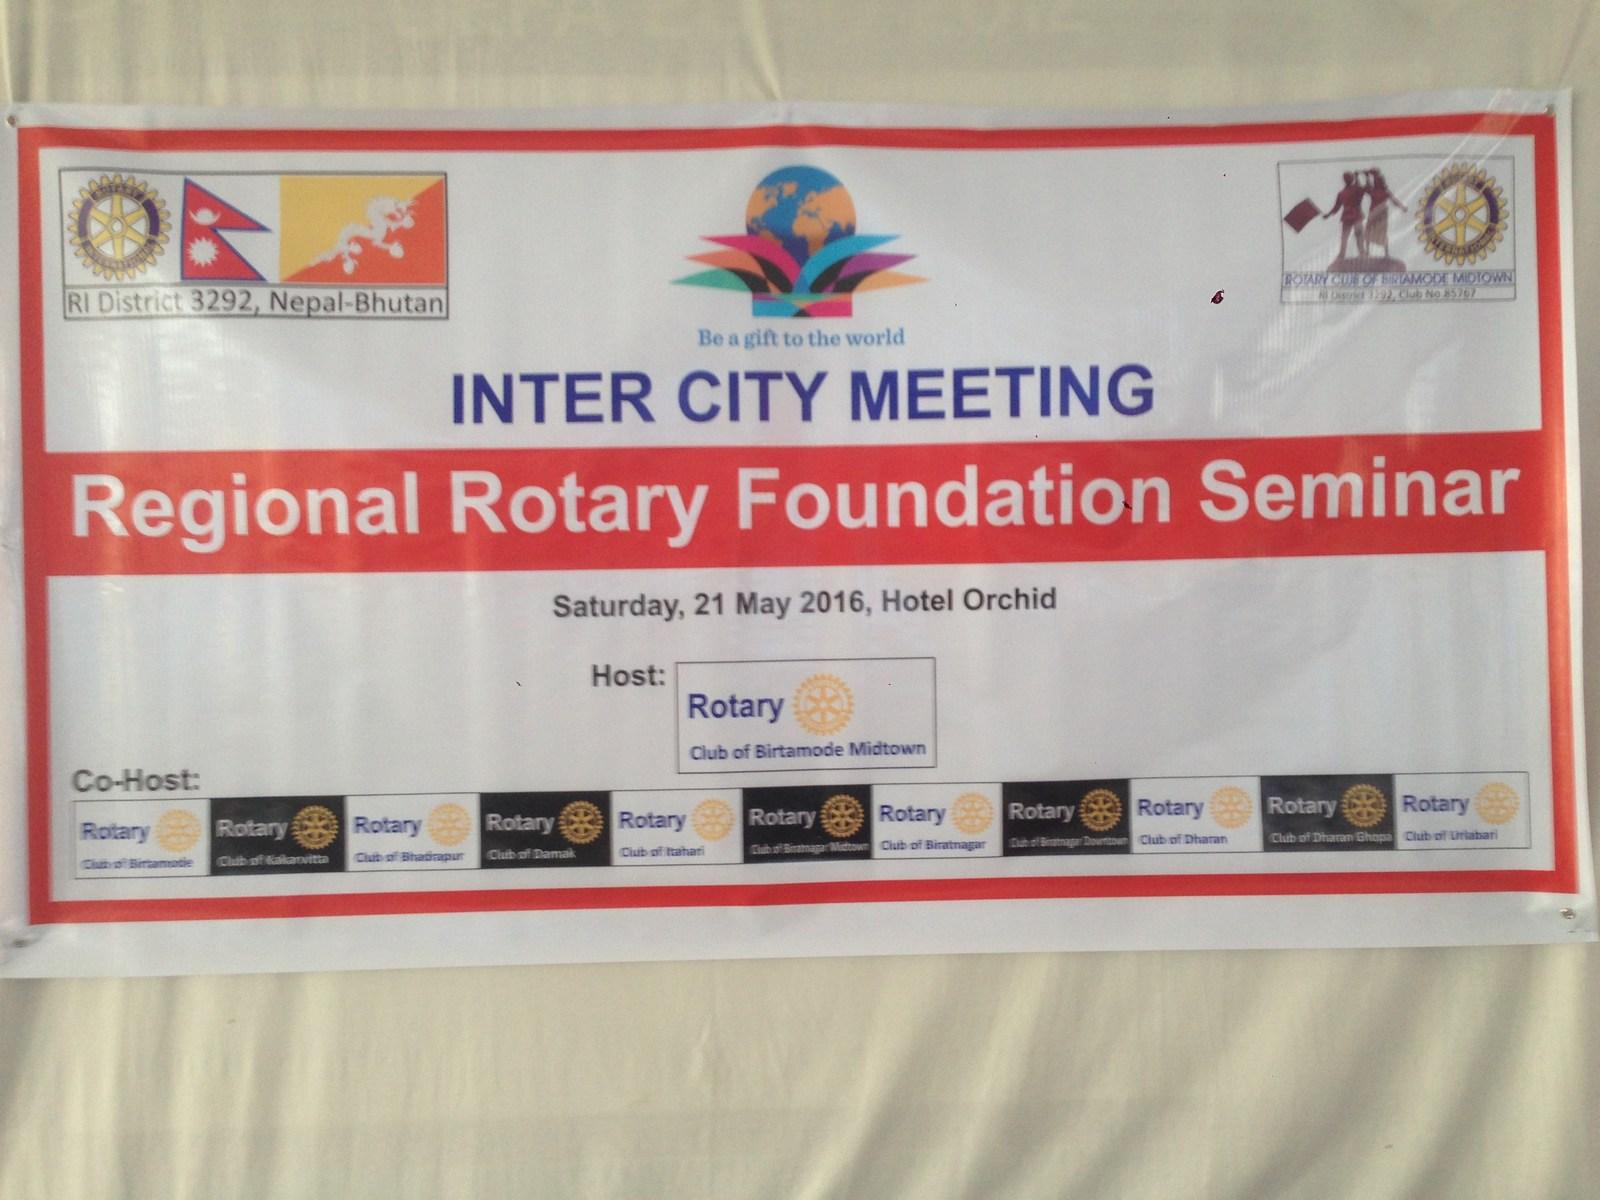 Regional-Rotary-Foundation-Seminar-Intercity-Meeting-Rotary-Club-of-Kakarvitta-1